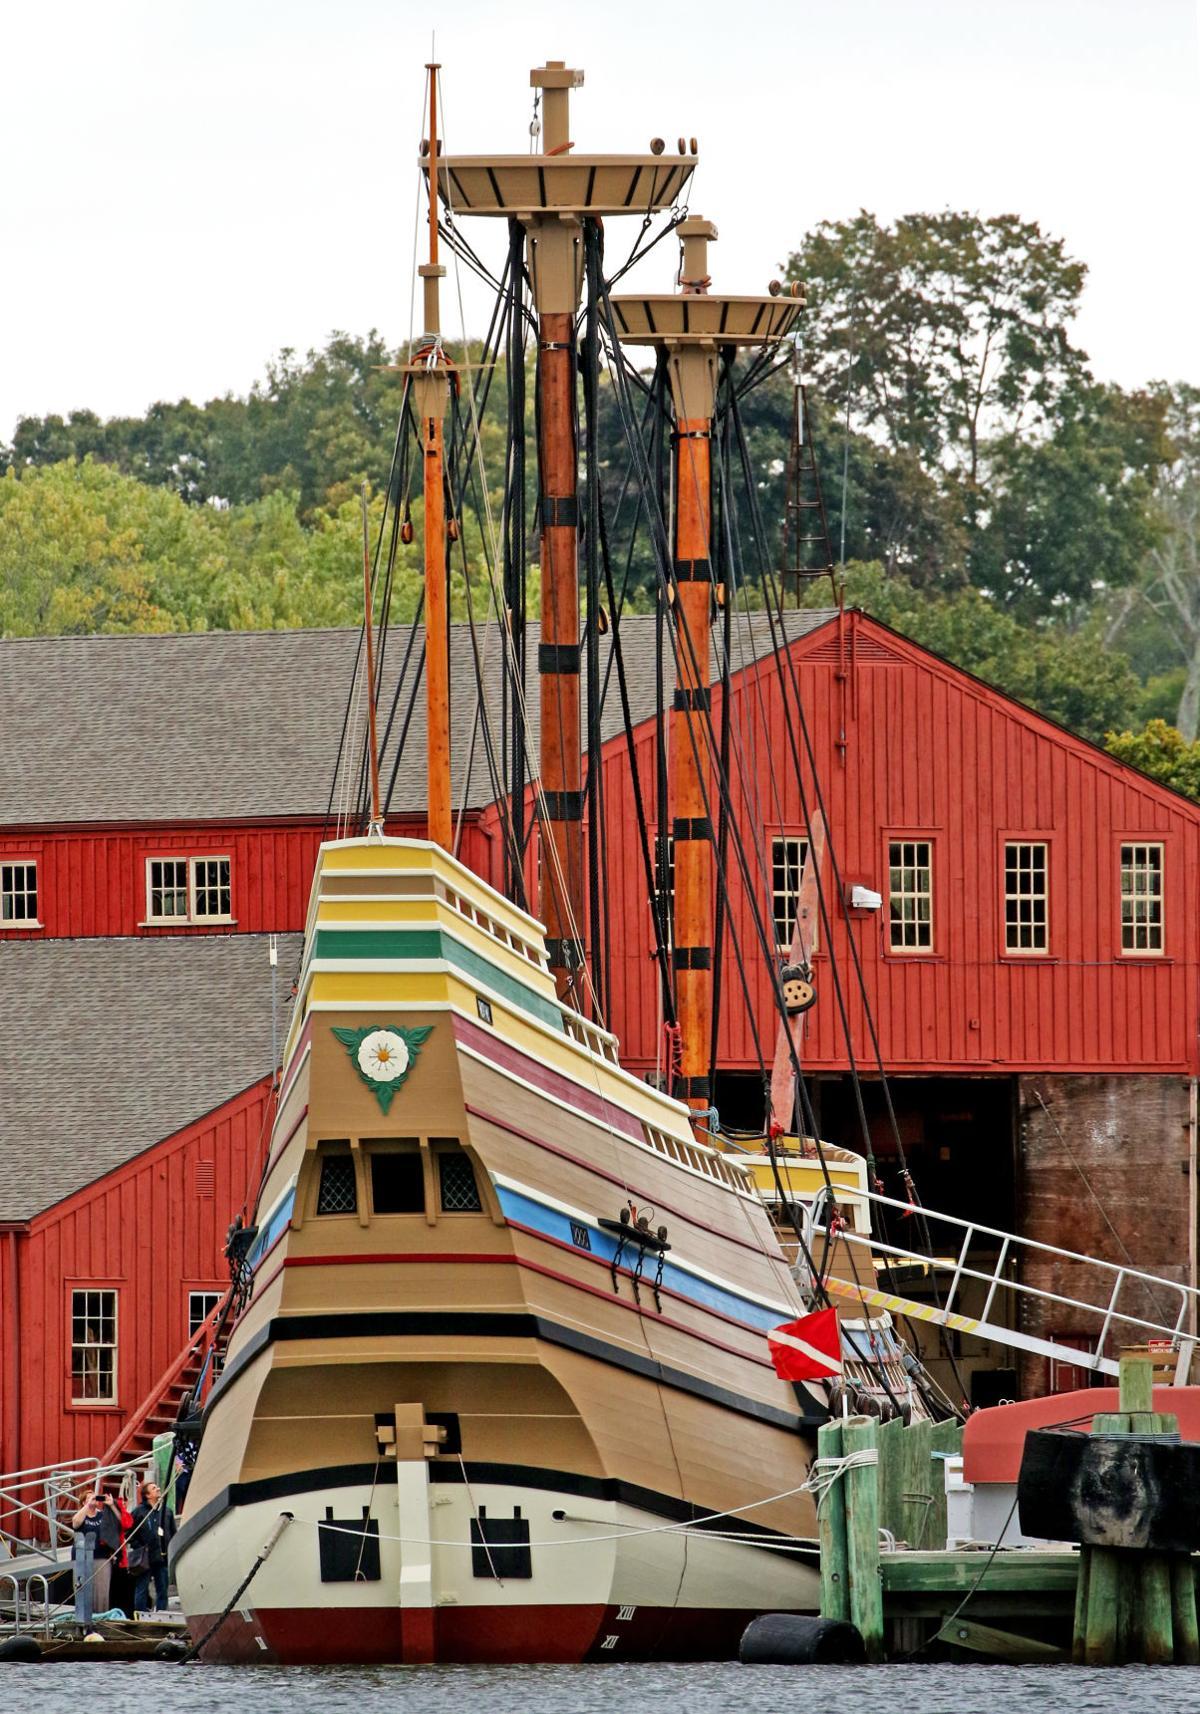 100119 MYS Masts on Mayflower II 969.JPG